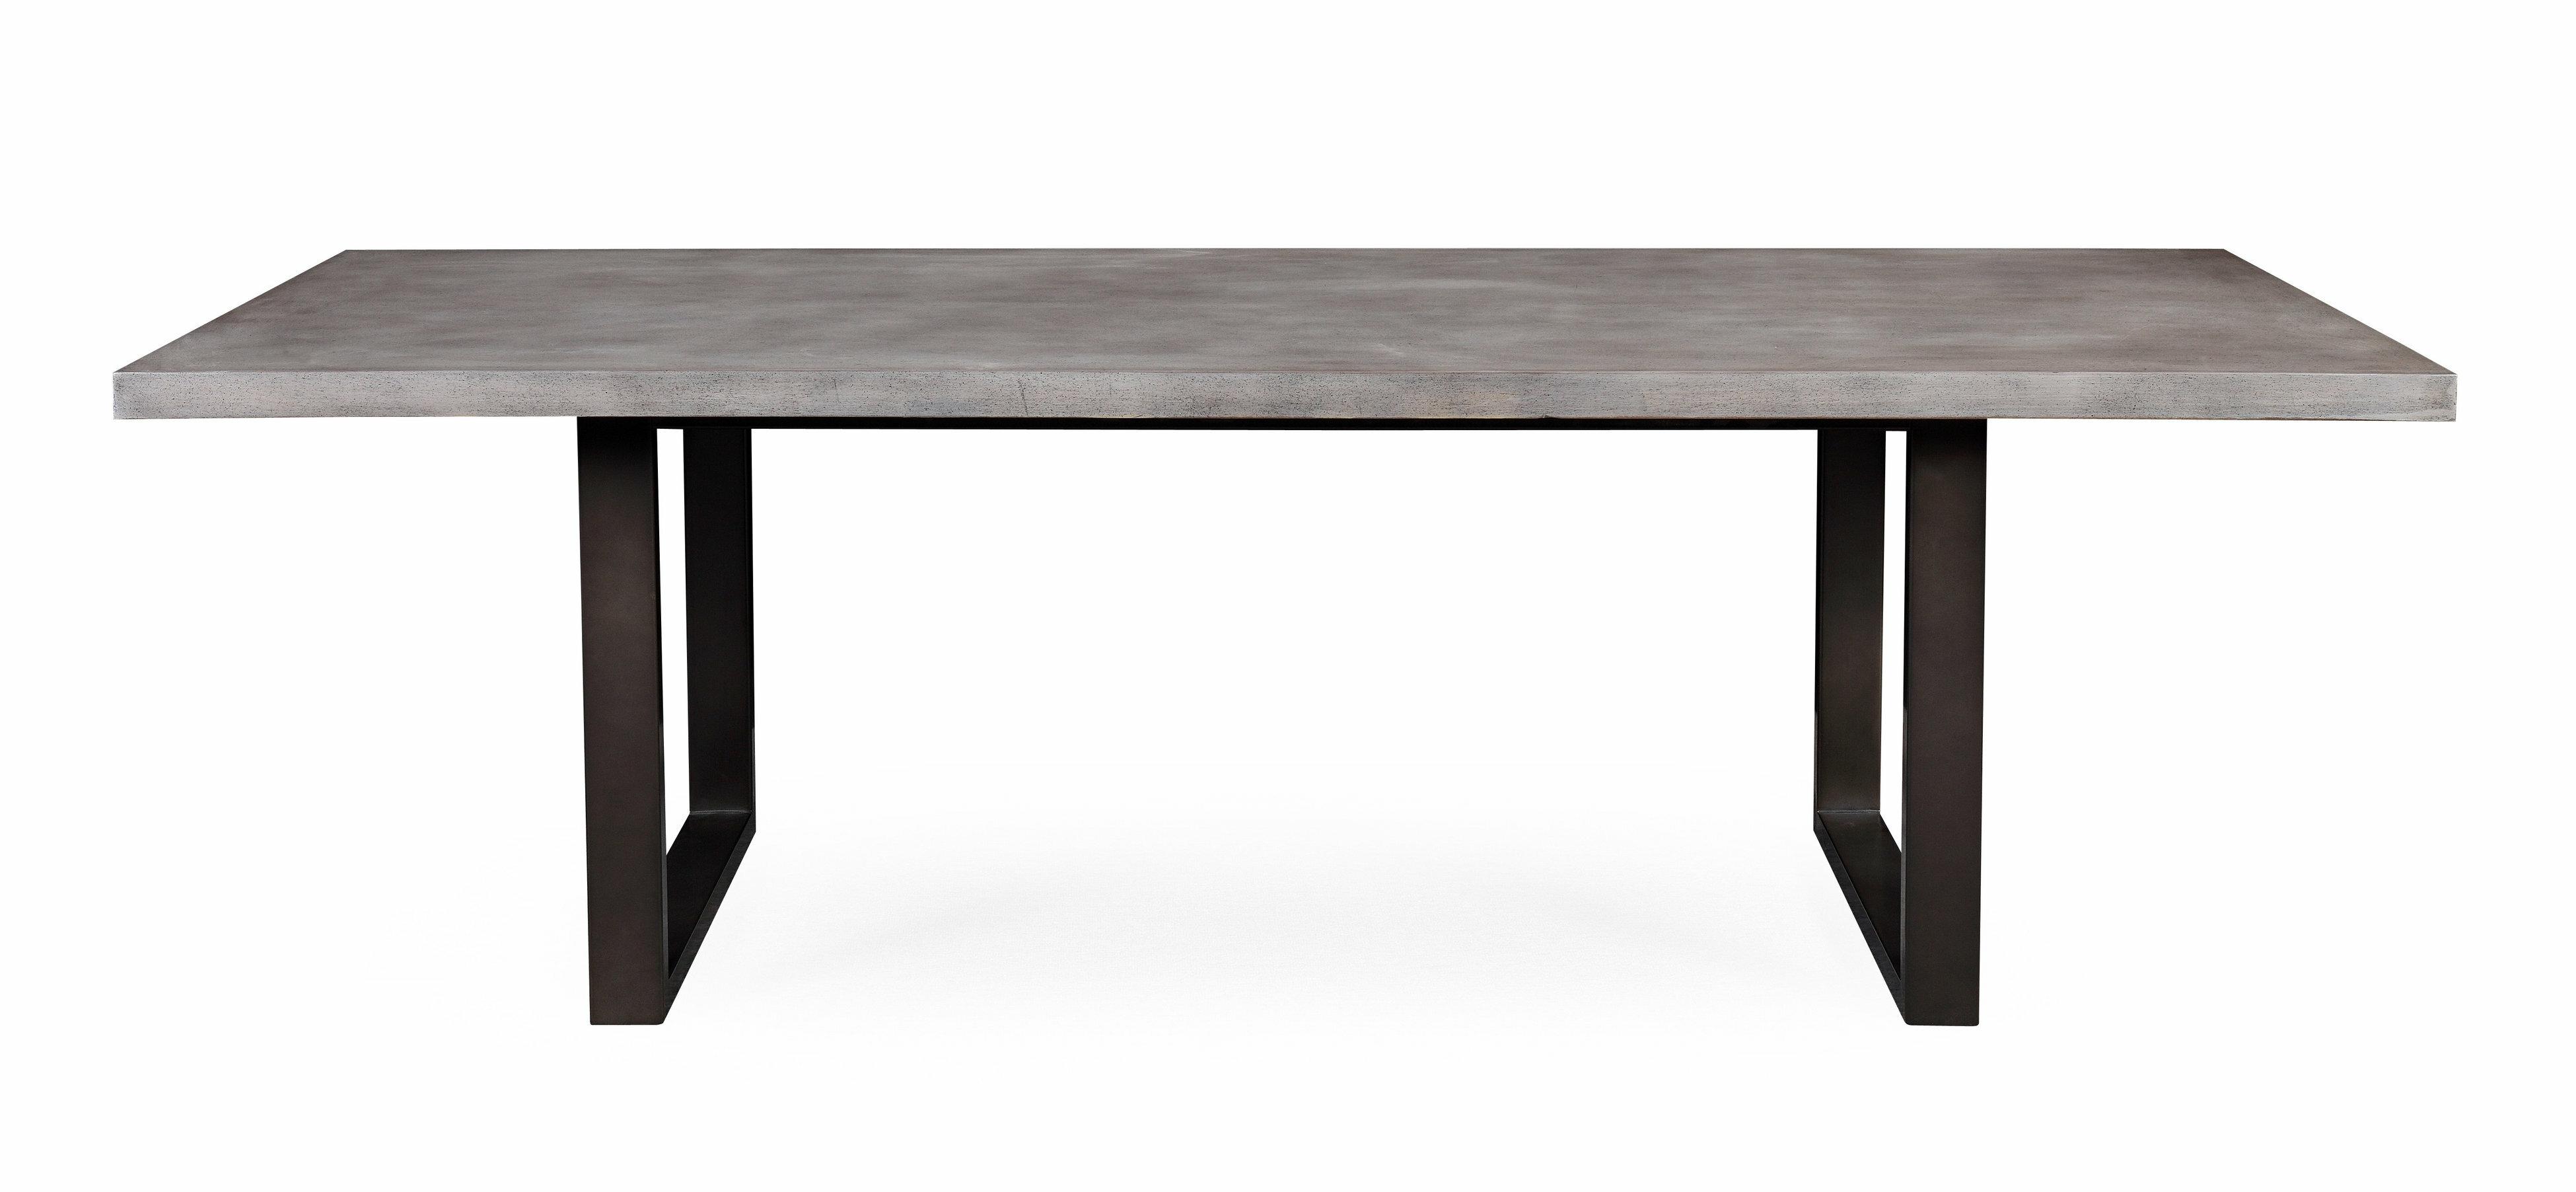 Carnarvon Concrete Dining Table